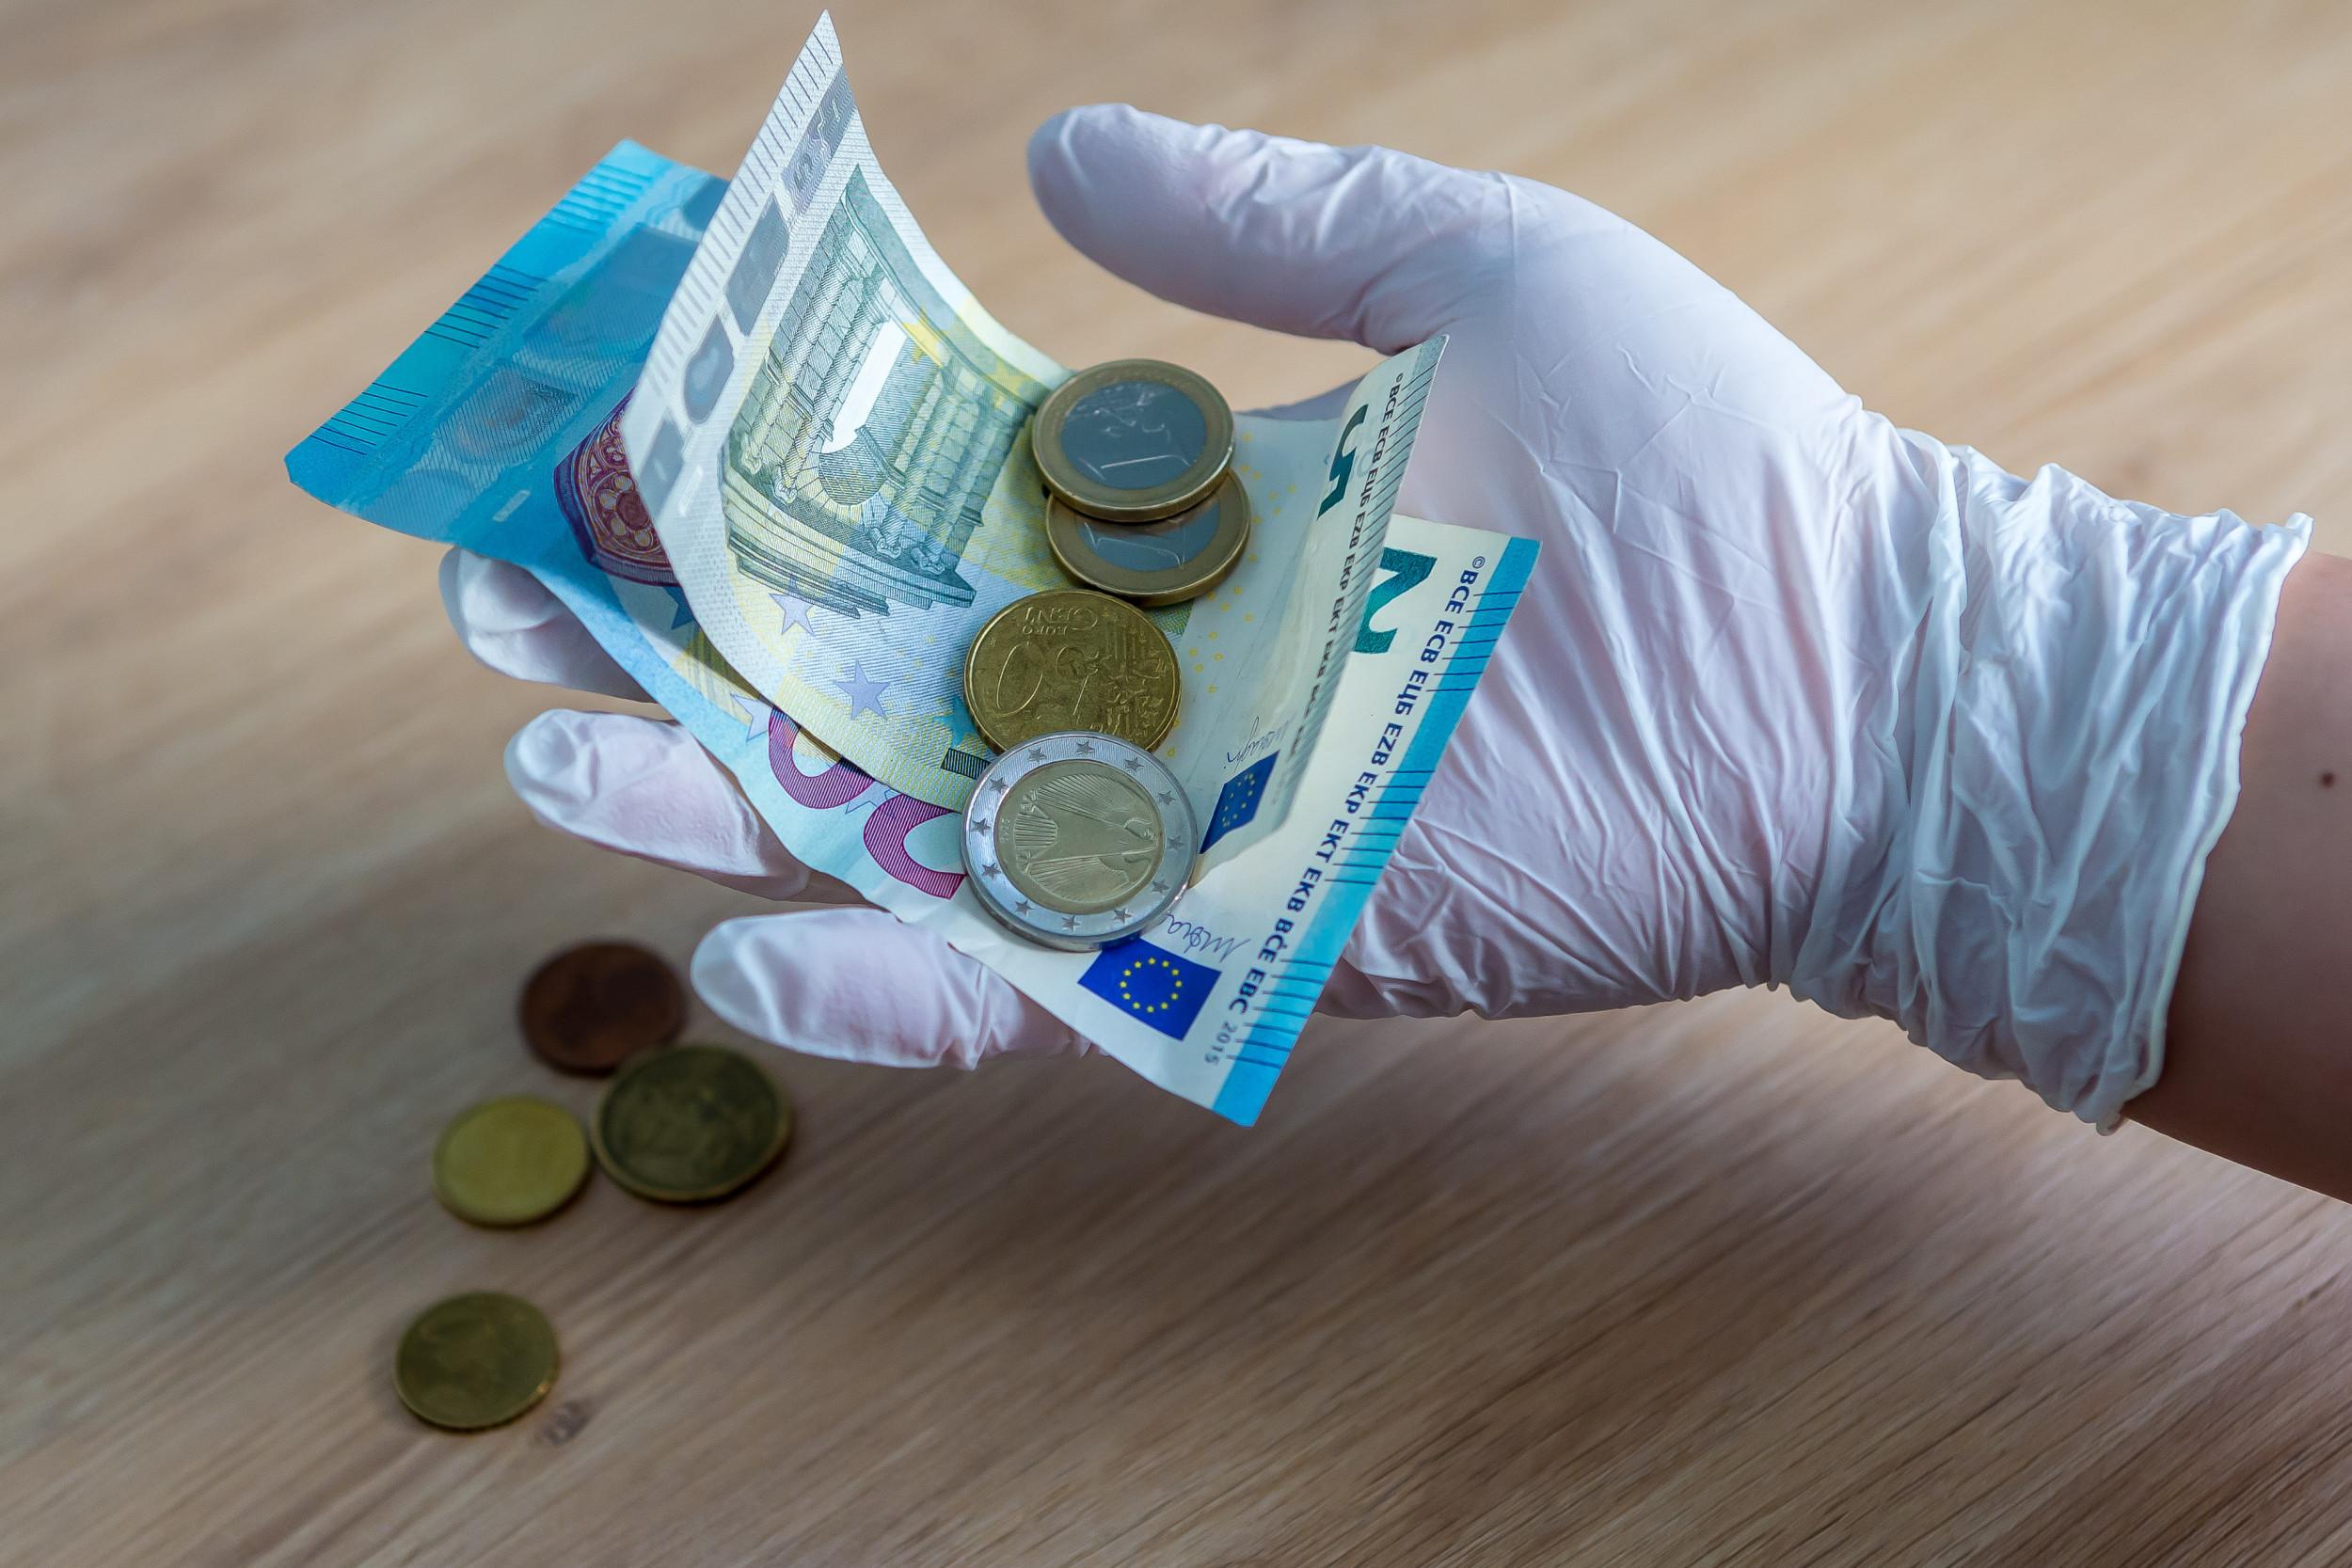 European Union money